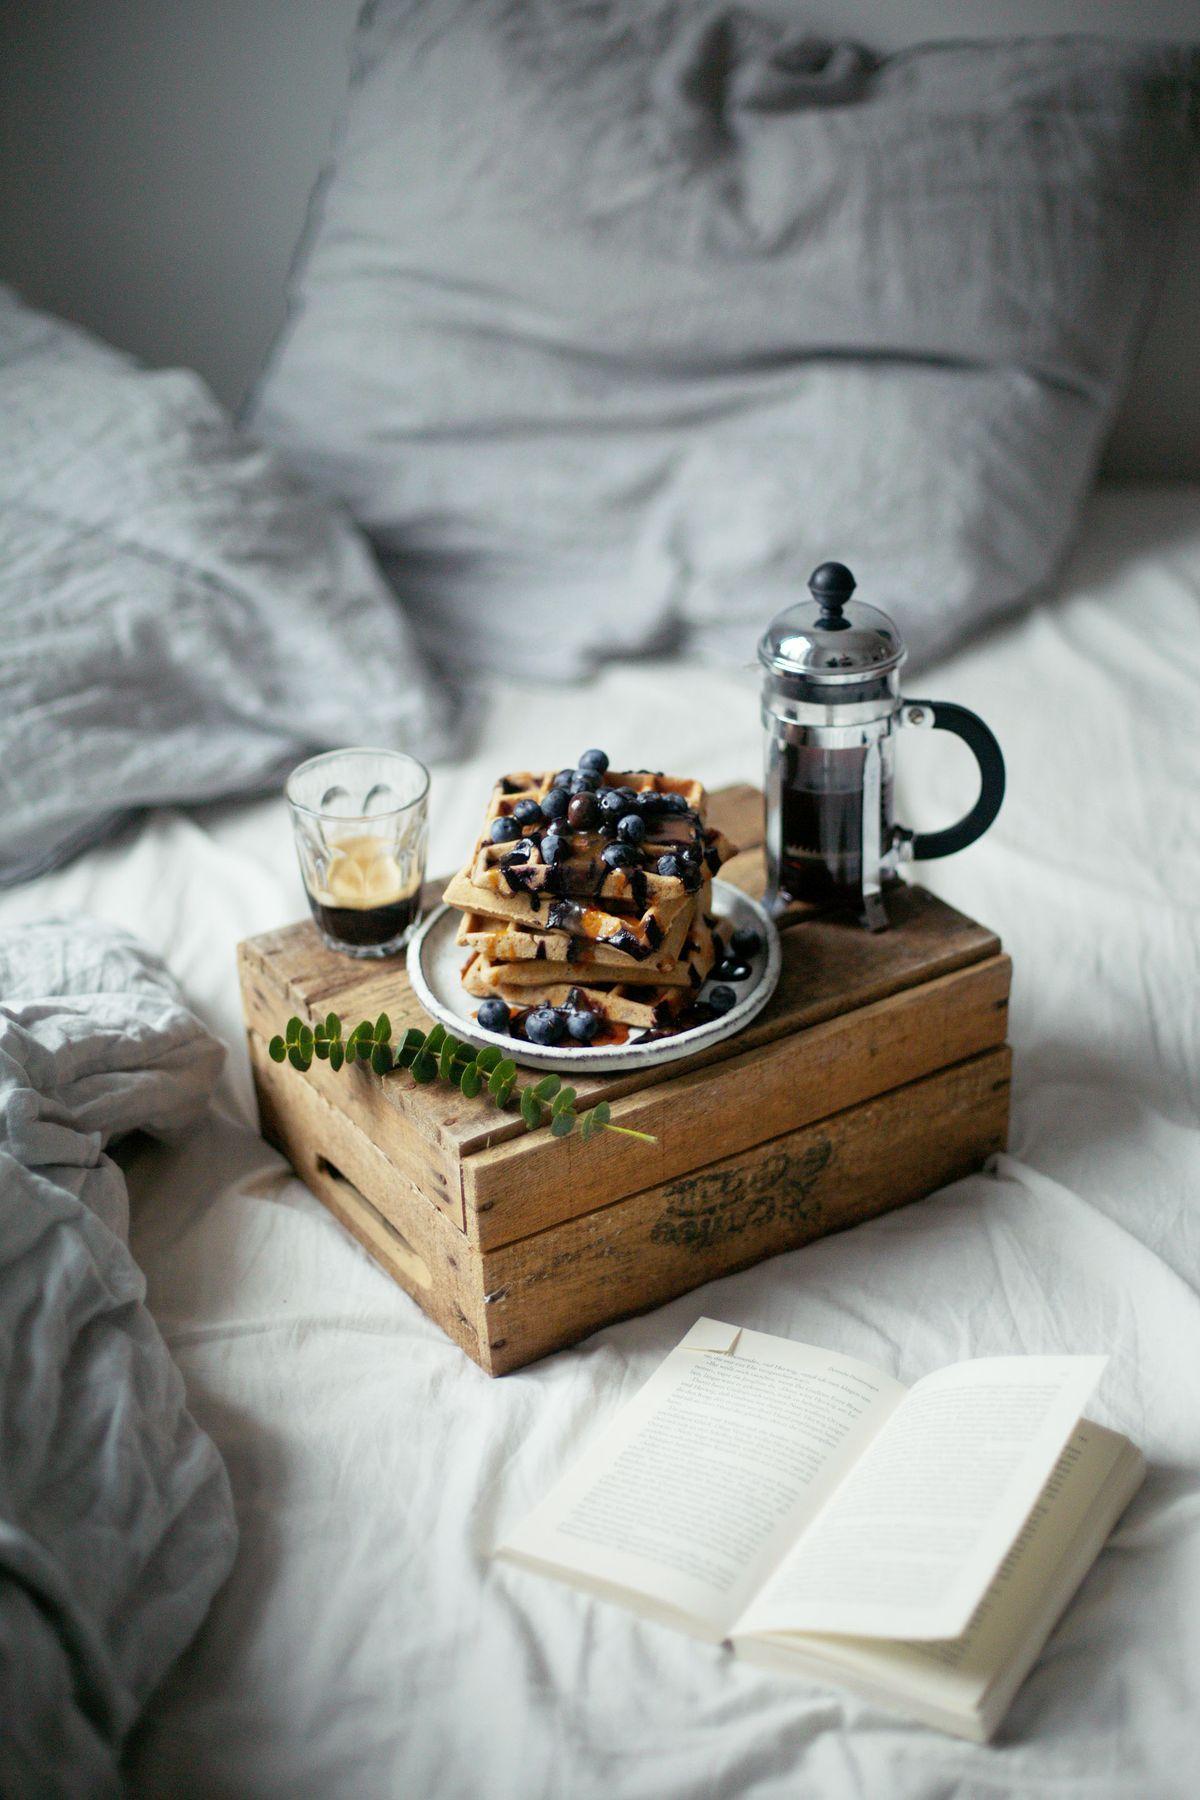 sunday breakfast in bed like by diaism acquire understanding attaism tjann atelier dia tjanntek. Black Bedroom Furniture Sets. Home Design Ideas